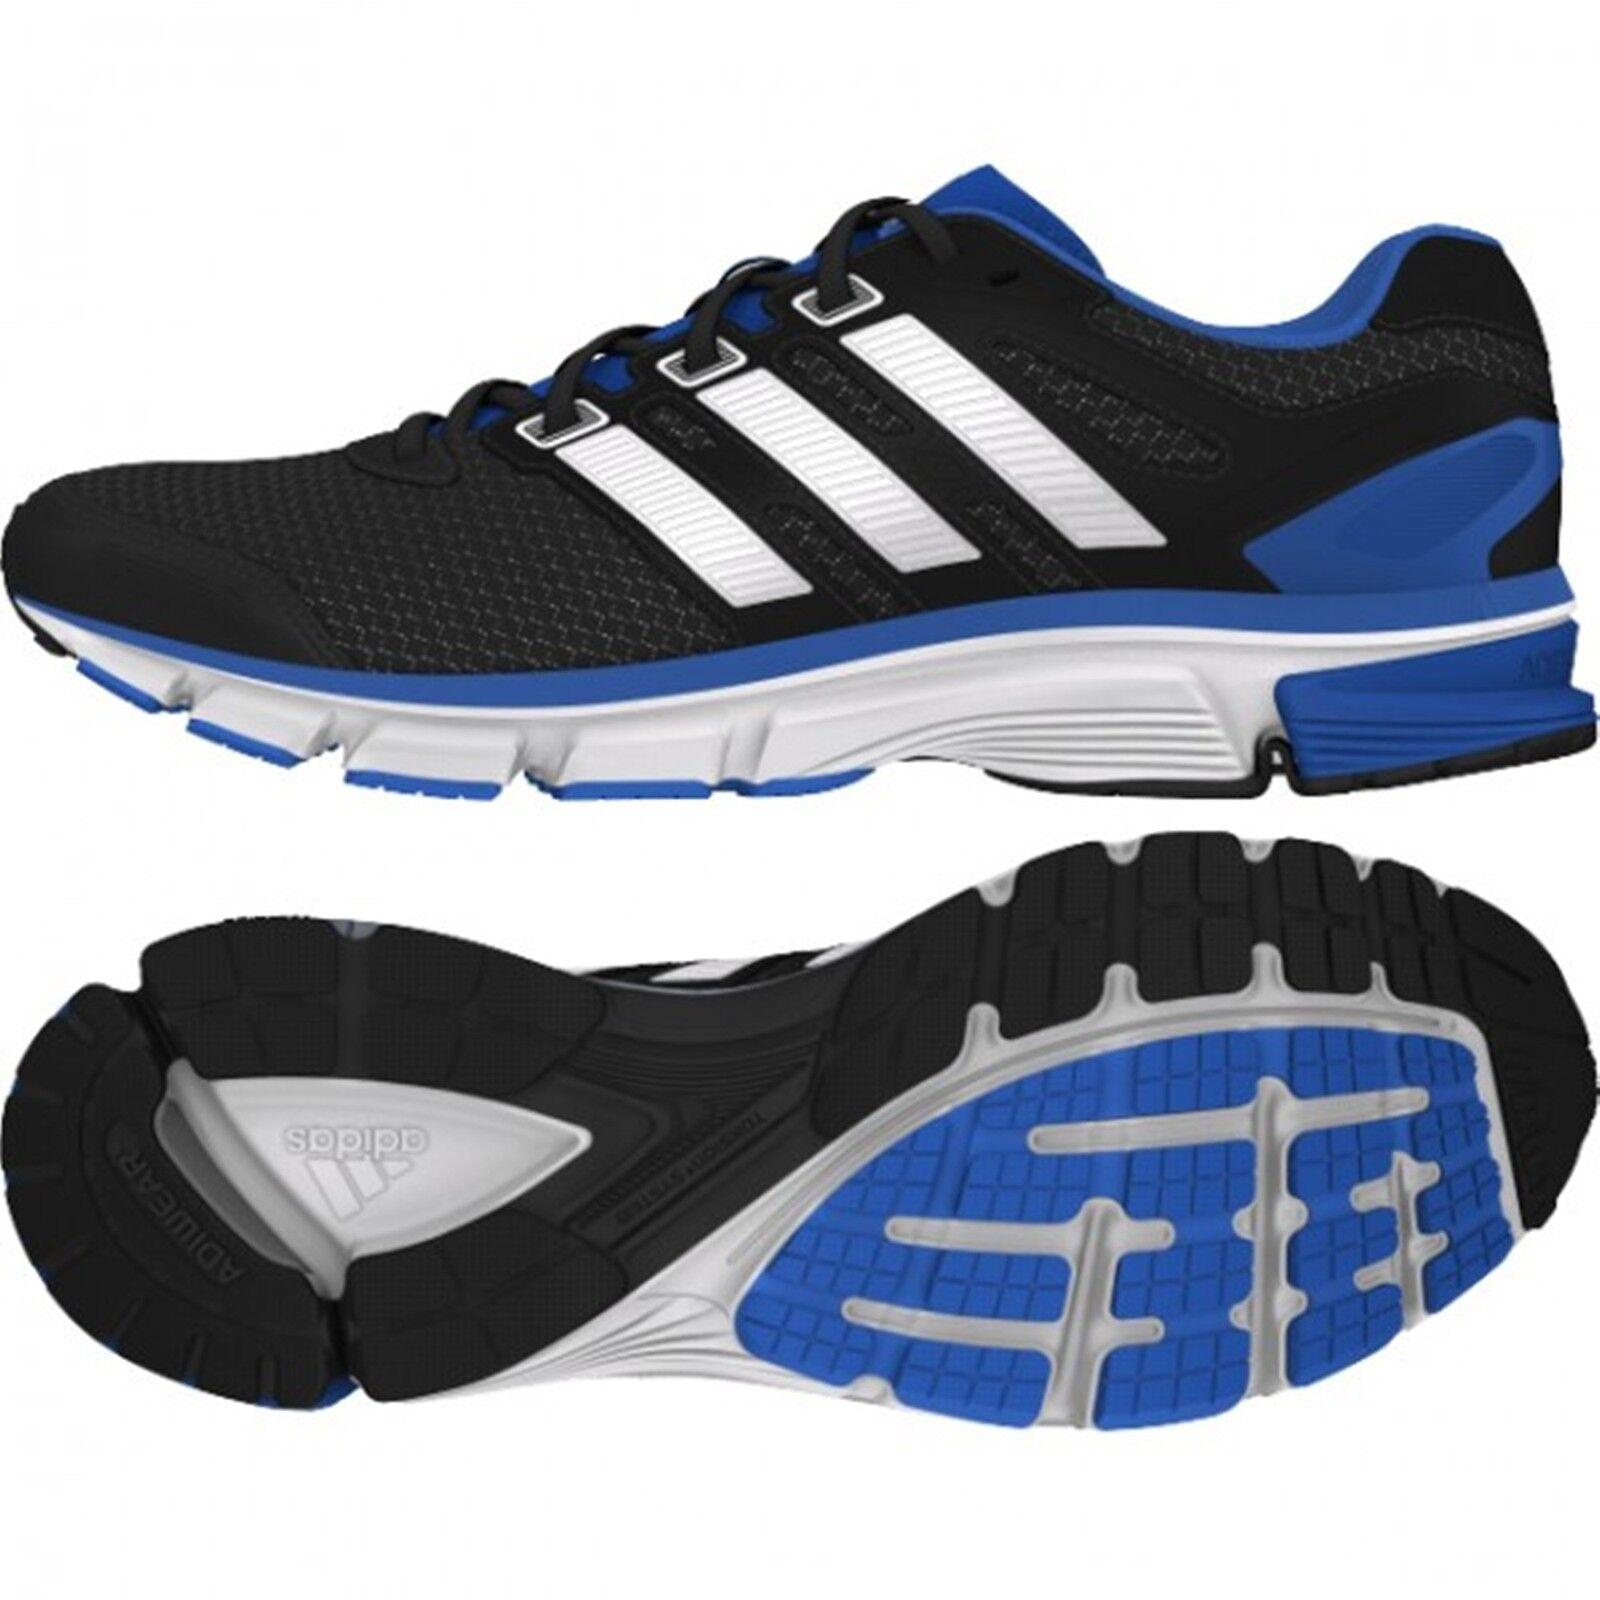 New Adidas Nova Nova Adidas Stability  Herren Performance Running Trainer Schuhes rrp  on Sale 728072